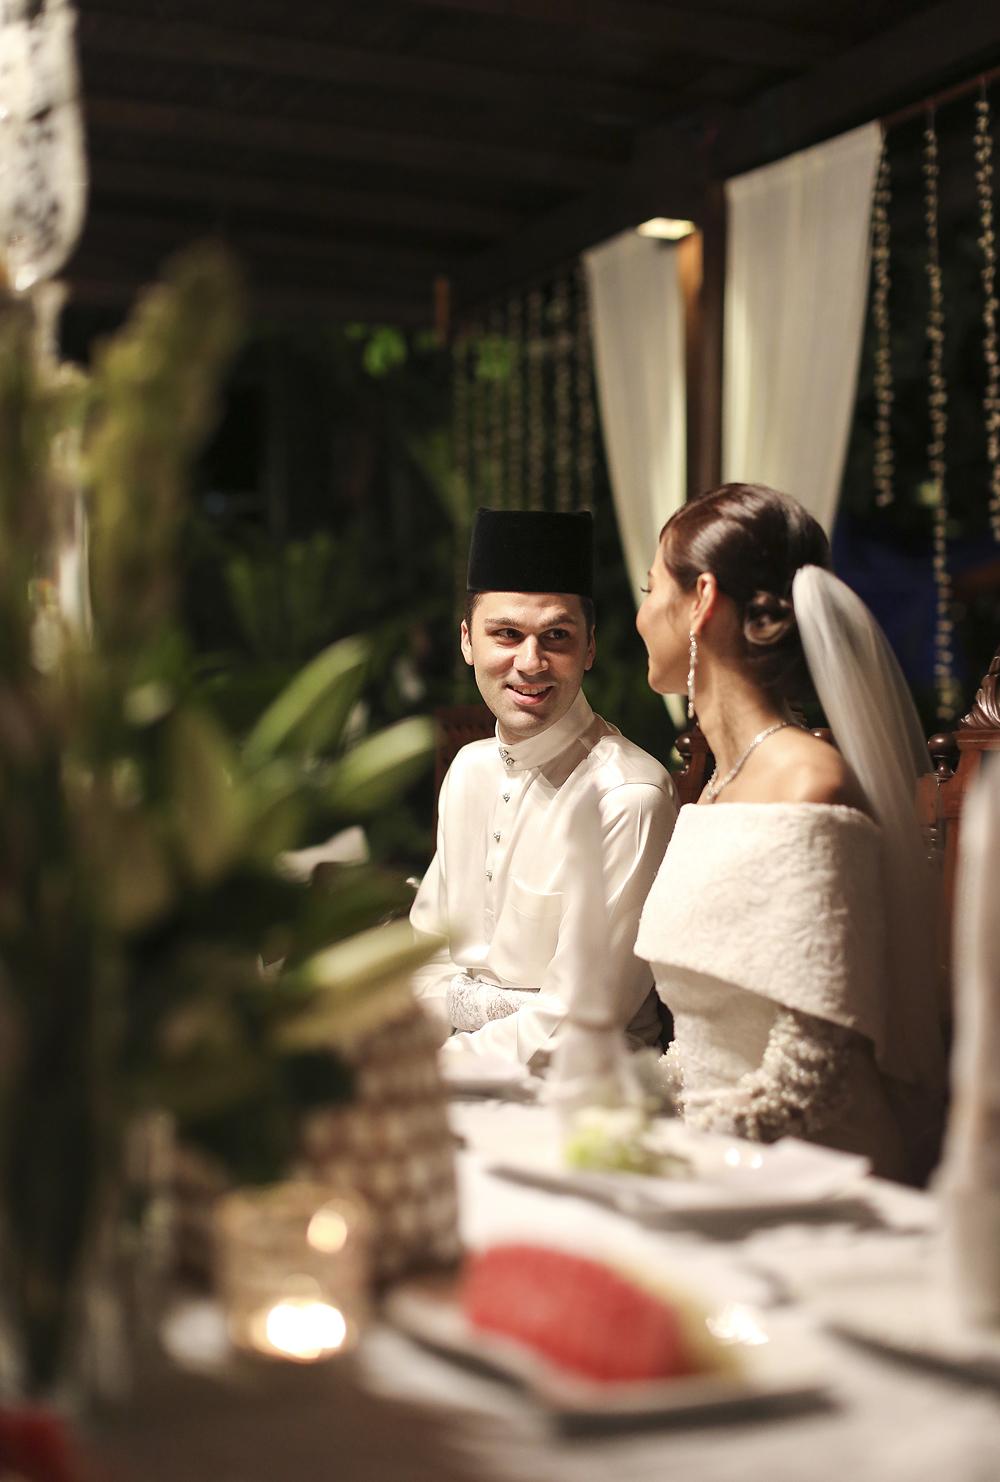 malaysia traditional malay wedding . the akad nikah of putera bruno araujo + puteri elfarezza . photography by kurt ahs ( perhapslifemoments ) . 7211.jpg